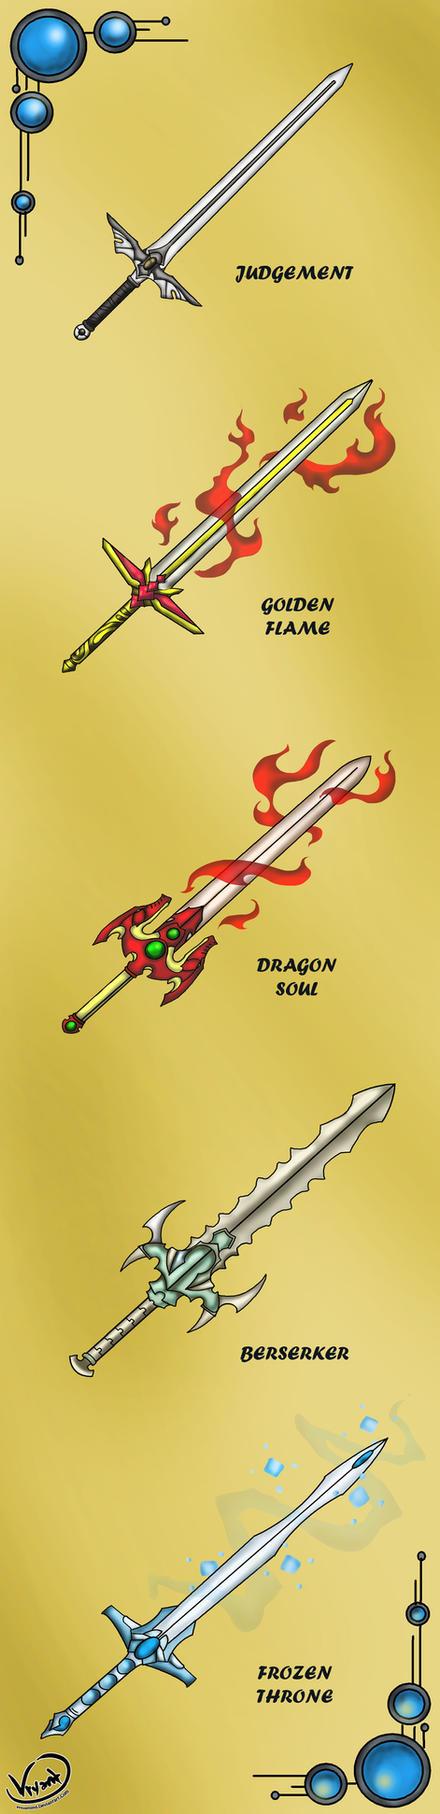 Swords Set Commission by AquaMind